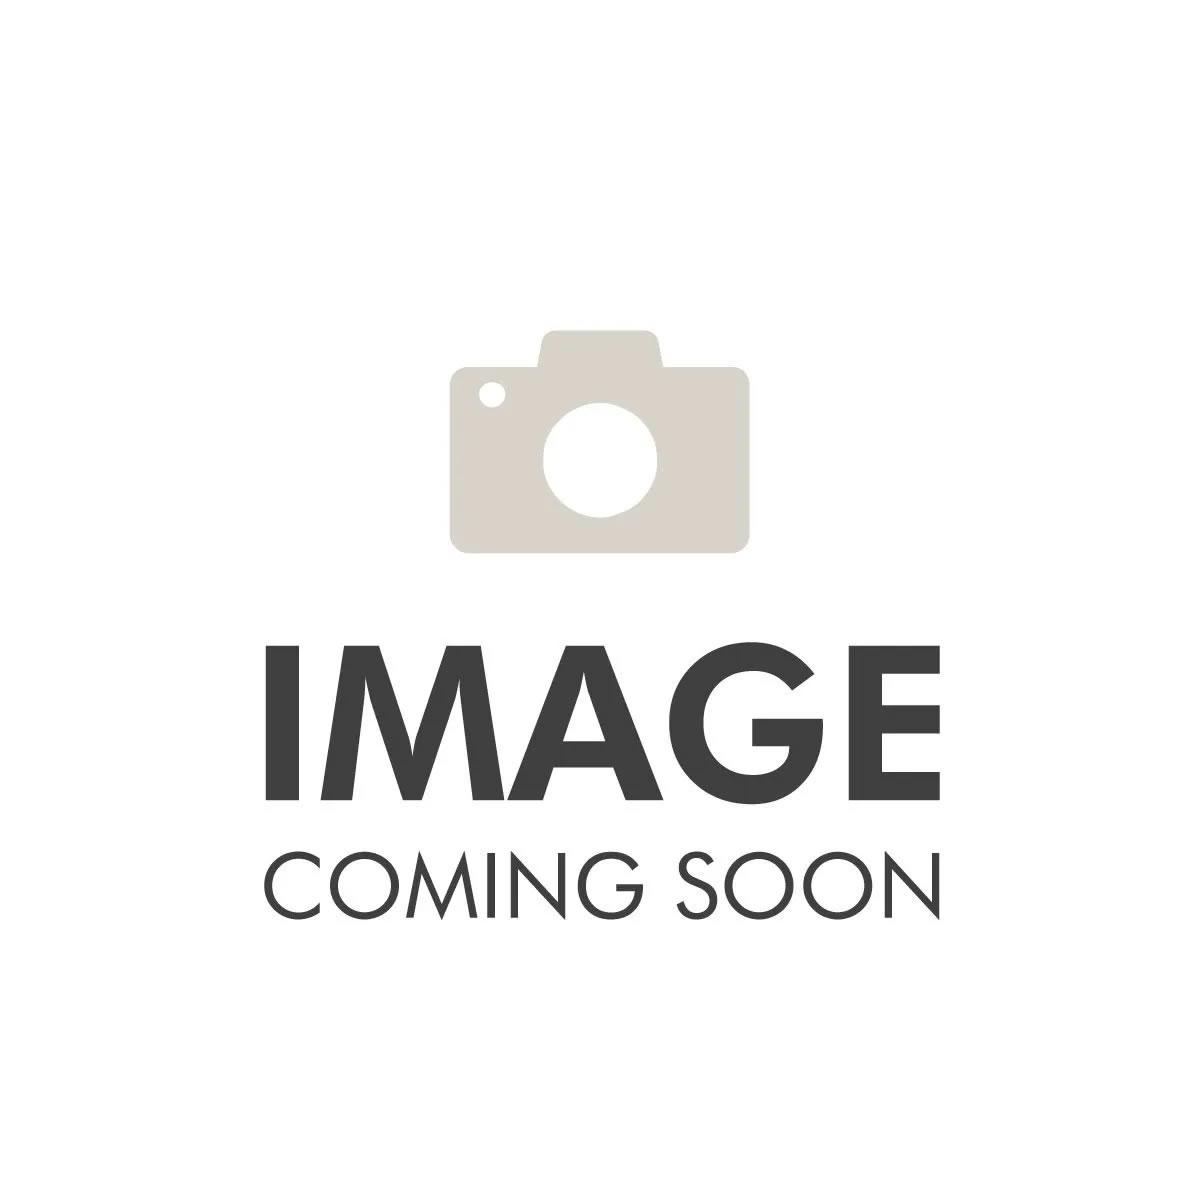 Tail Light Euro Guards, 07-18 Jeep Wrangler JK